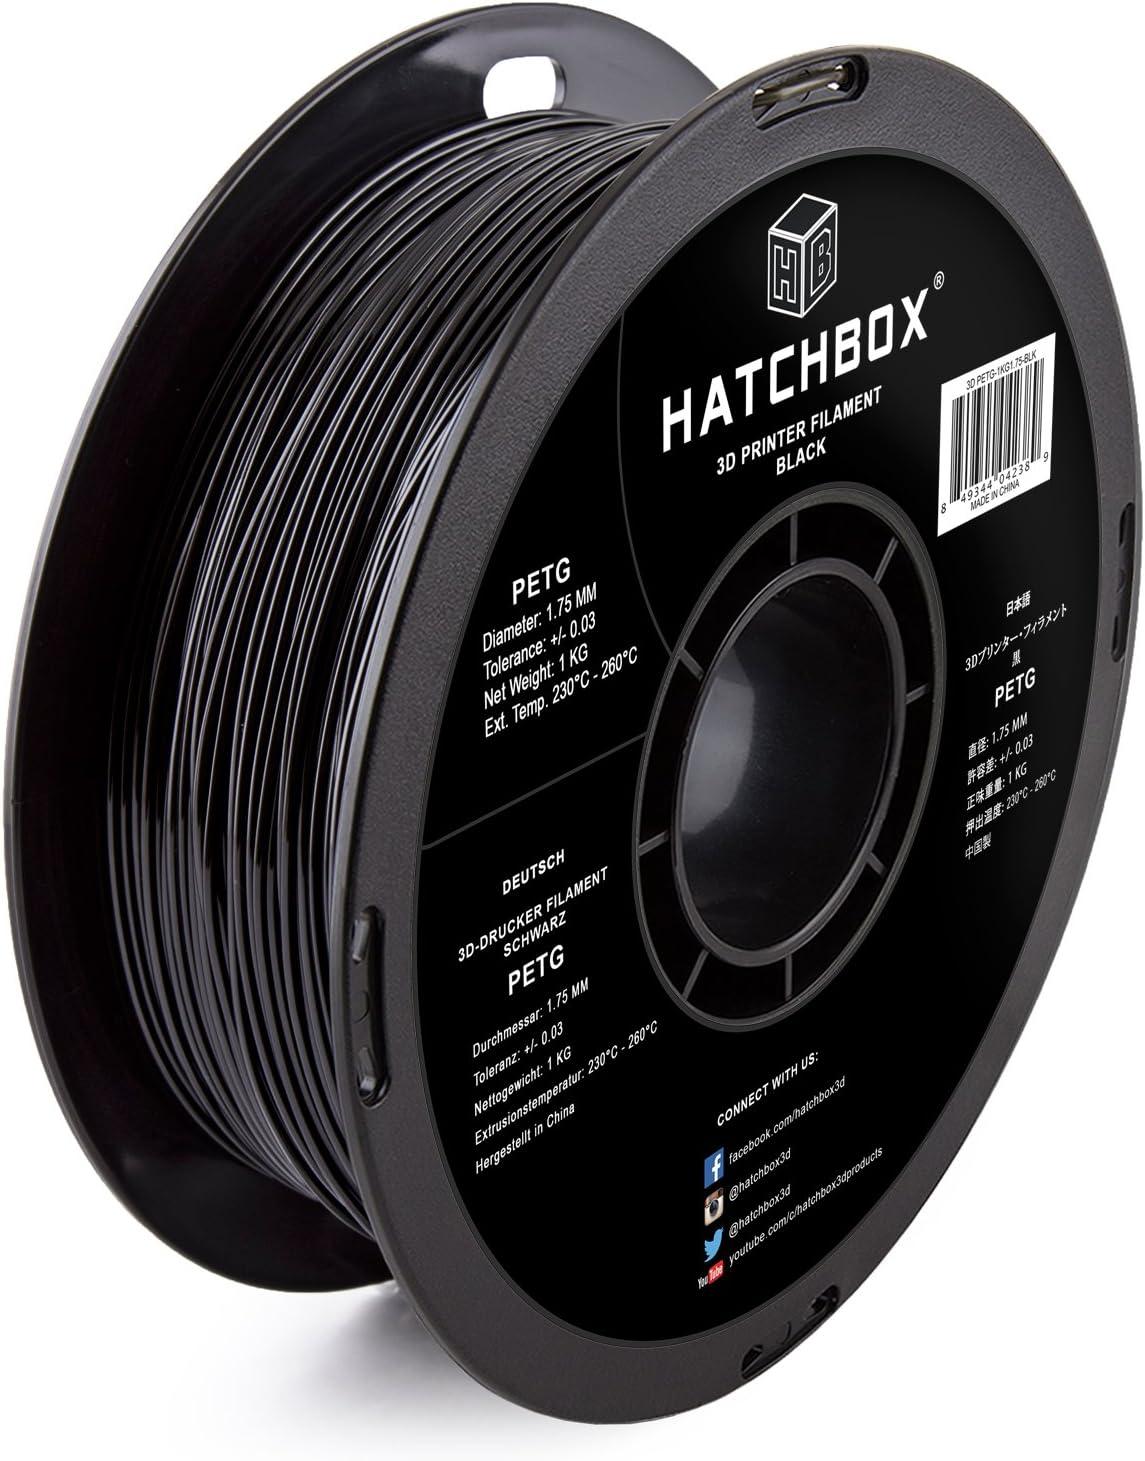 HATCHBOX PETG 3D Printer Filament, Dimensional Accuracy +/- 0.03 mm, 1 kg Spool, 1.75 mm, Black